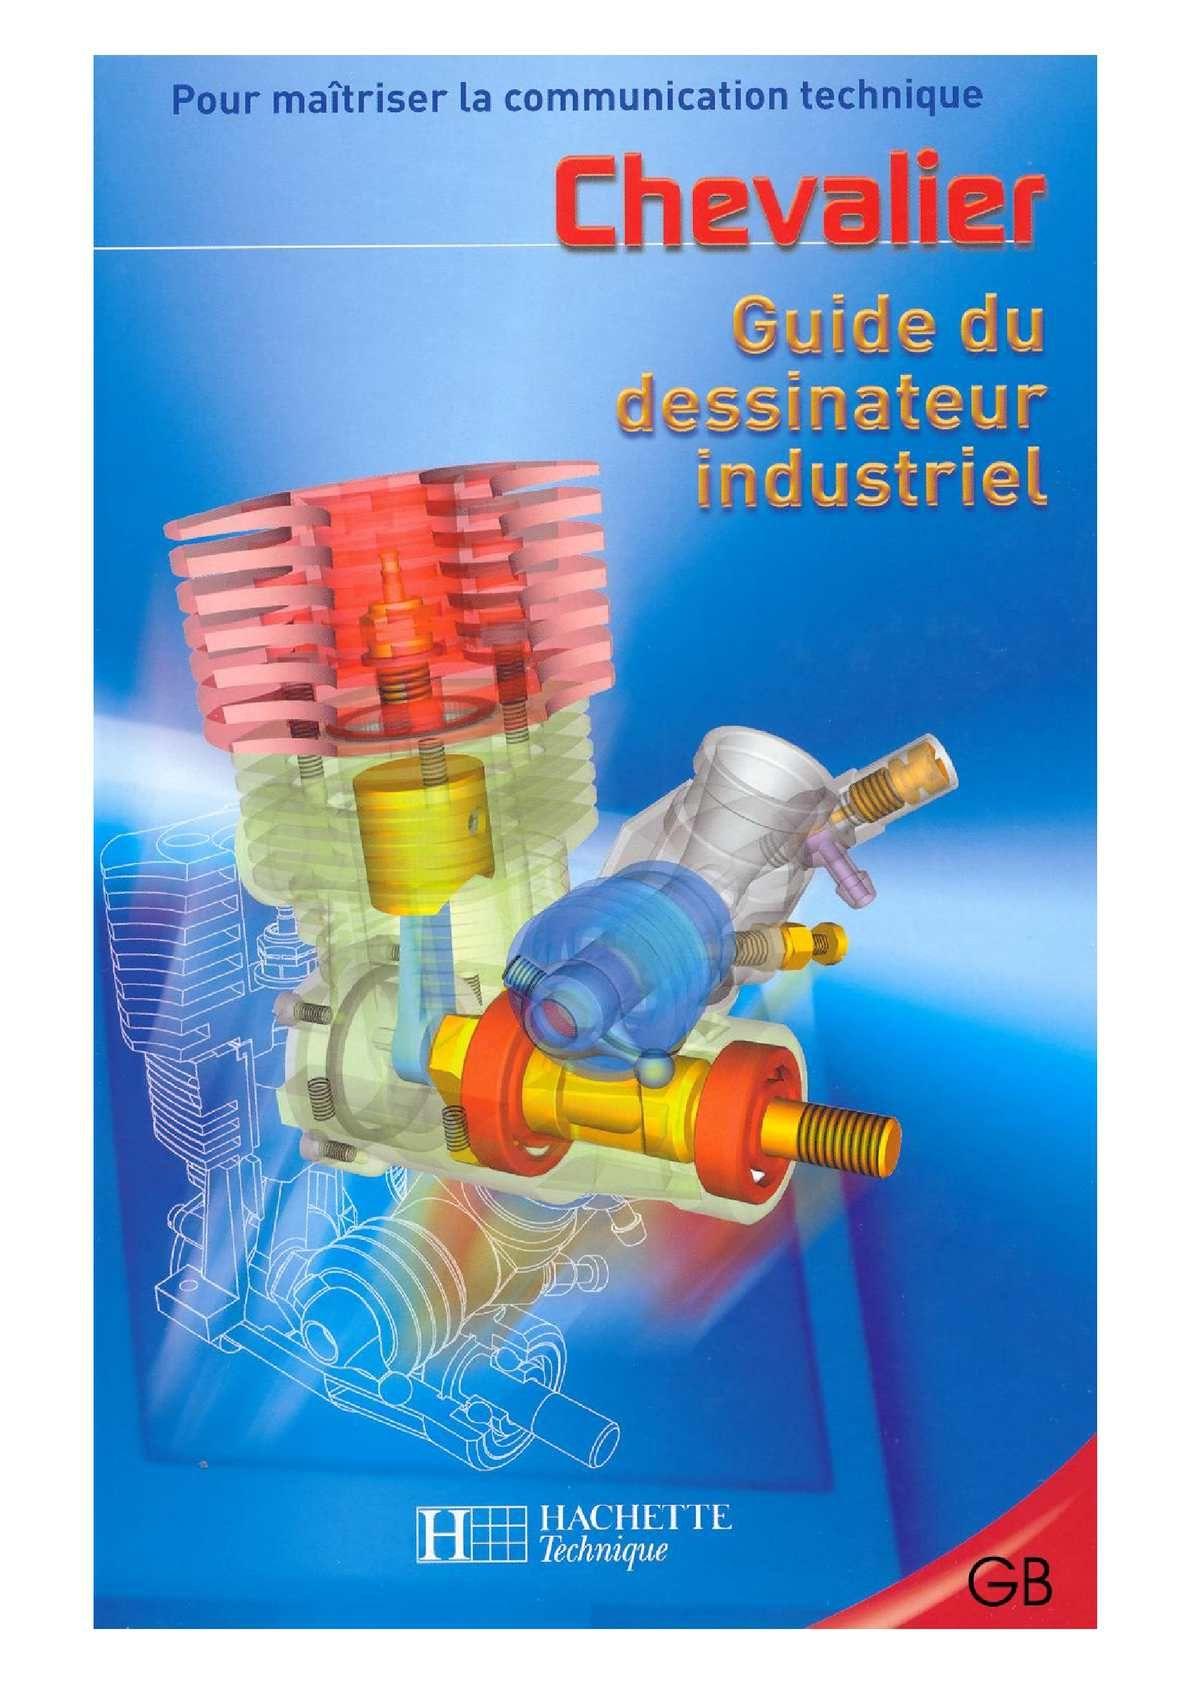 Guide Du Dessinateur Industriel Pdf : guide, dessinateur, industriel, Print, Guide, Dessinateur, Industriel, Chevalier, Books, Online,, Books,, Orthographic, Drawing